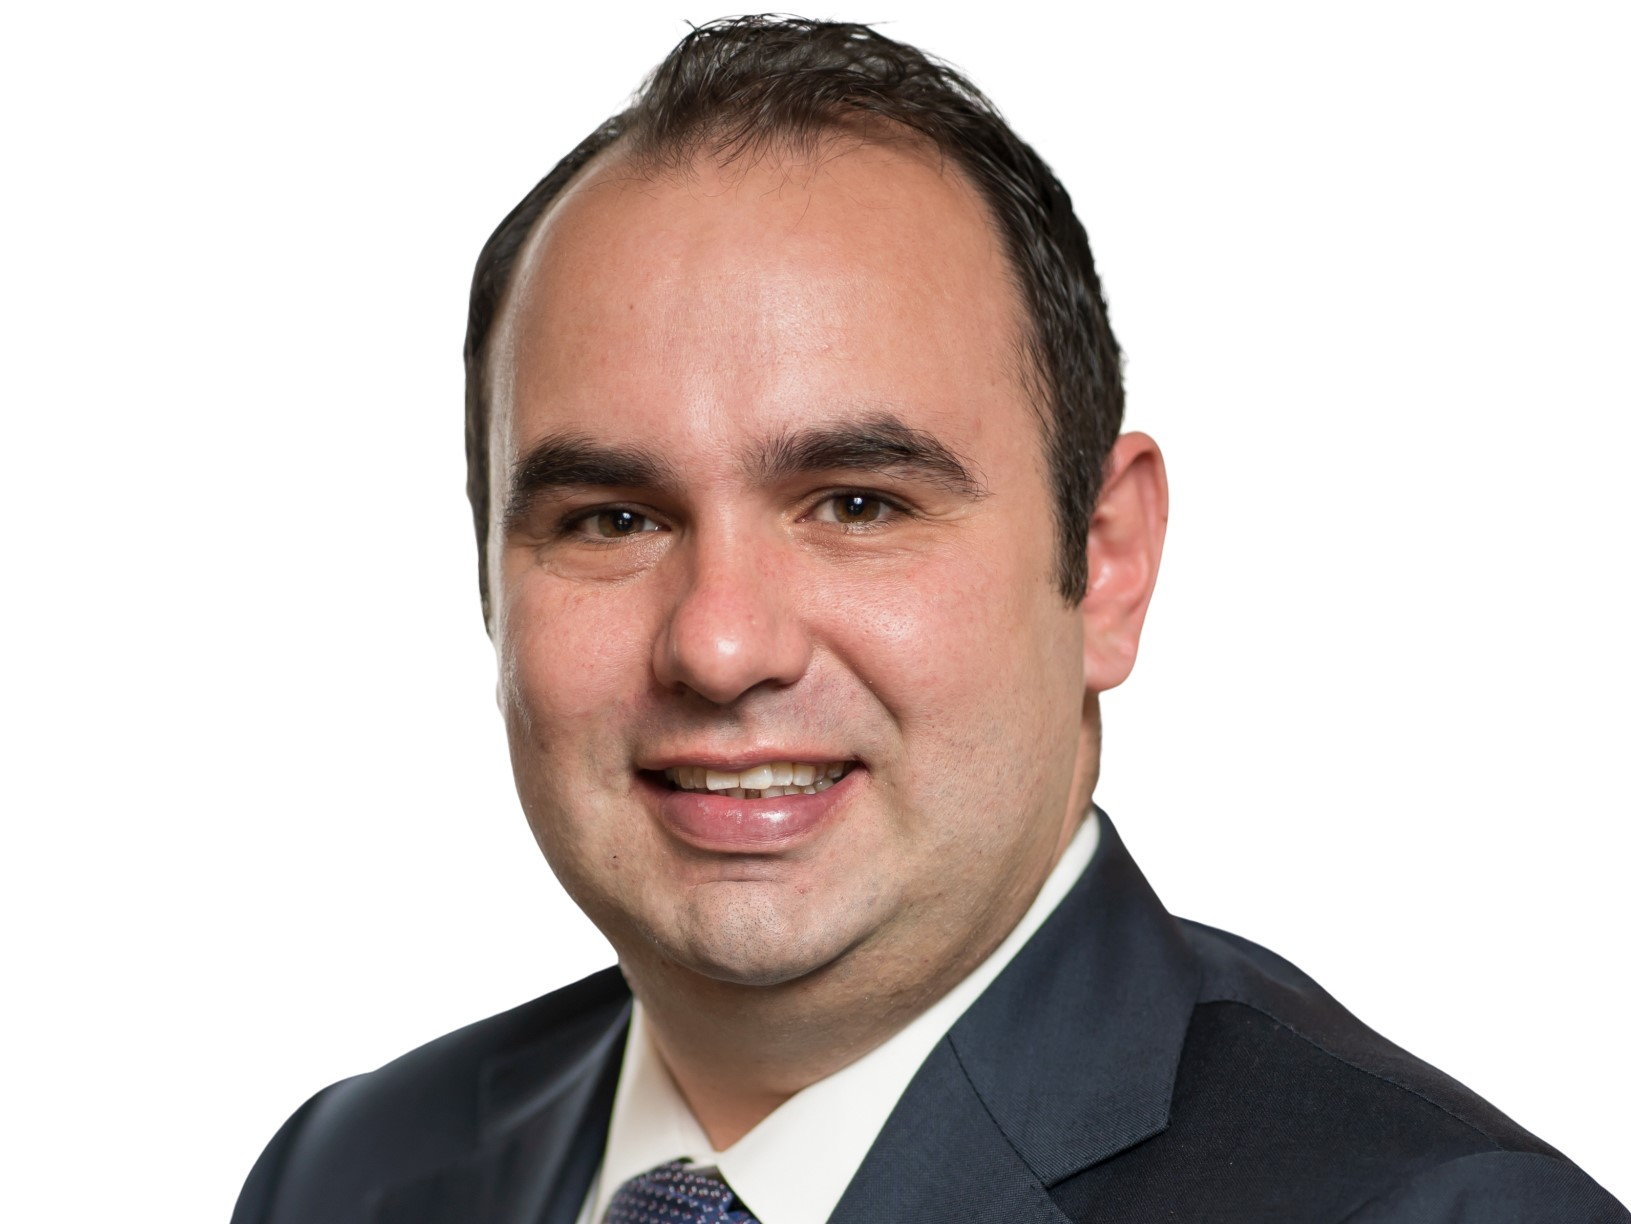 Oliver Somoza, Principal, Turnkey Property Pro